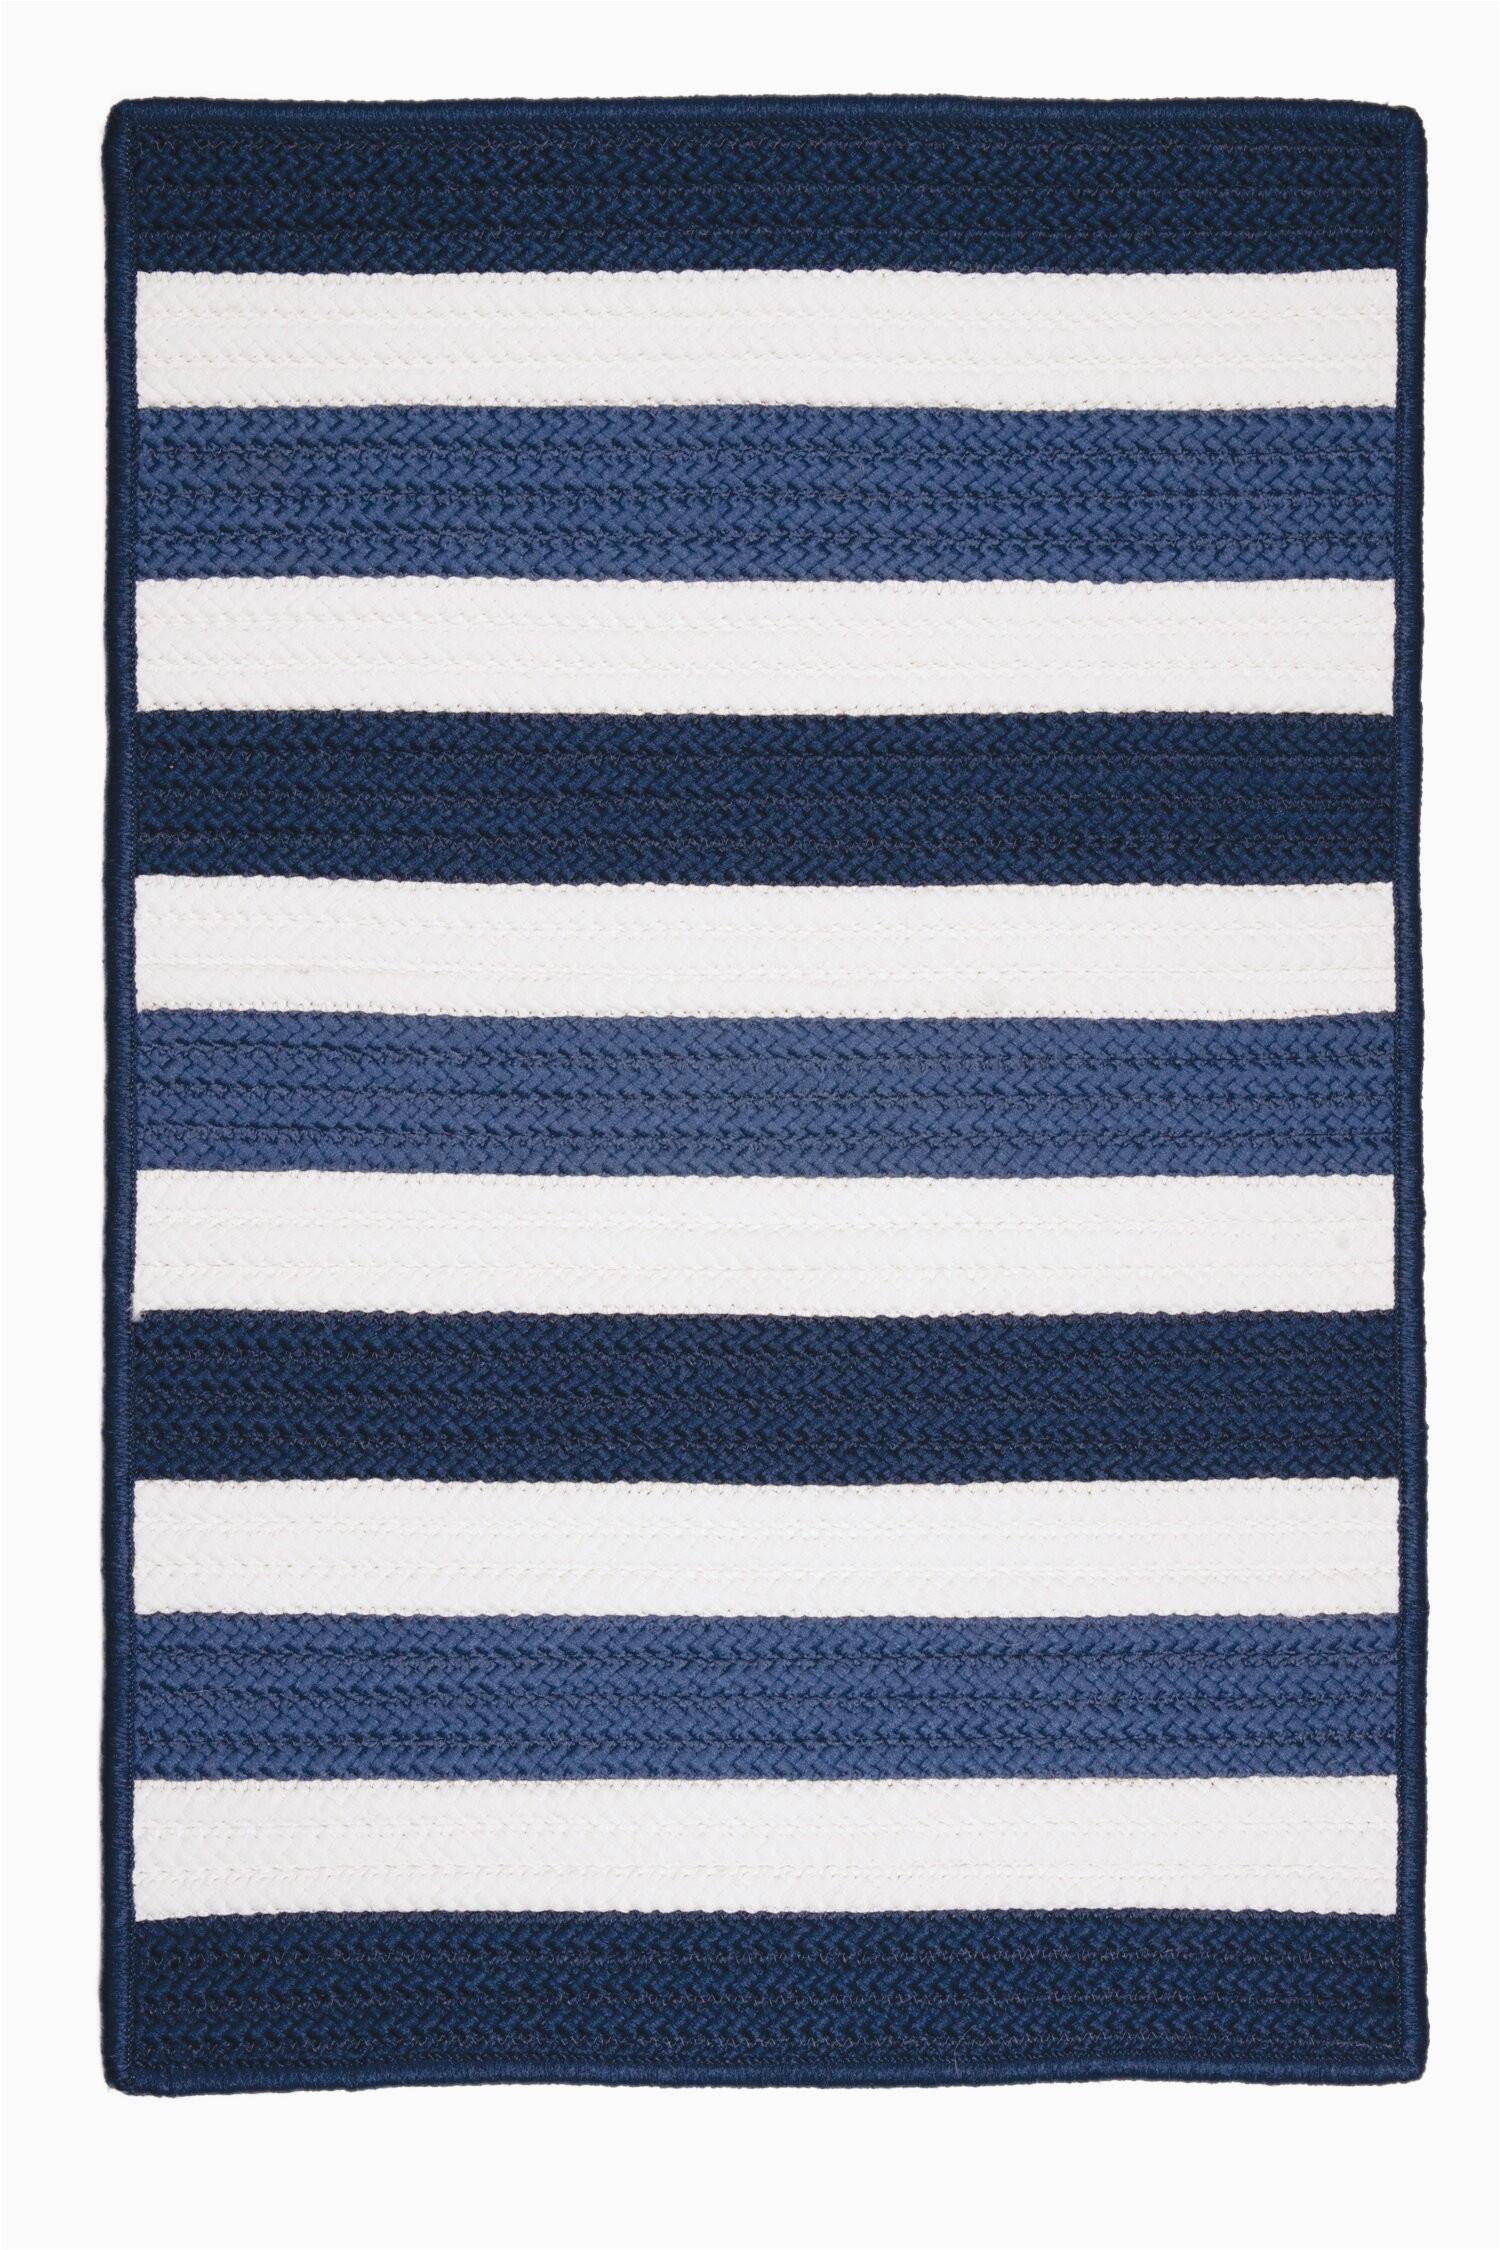 9 x 12 nautical area rugs c a a